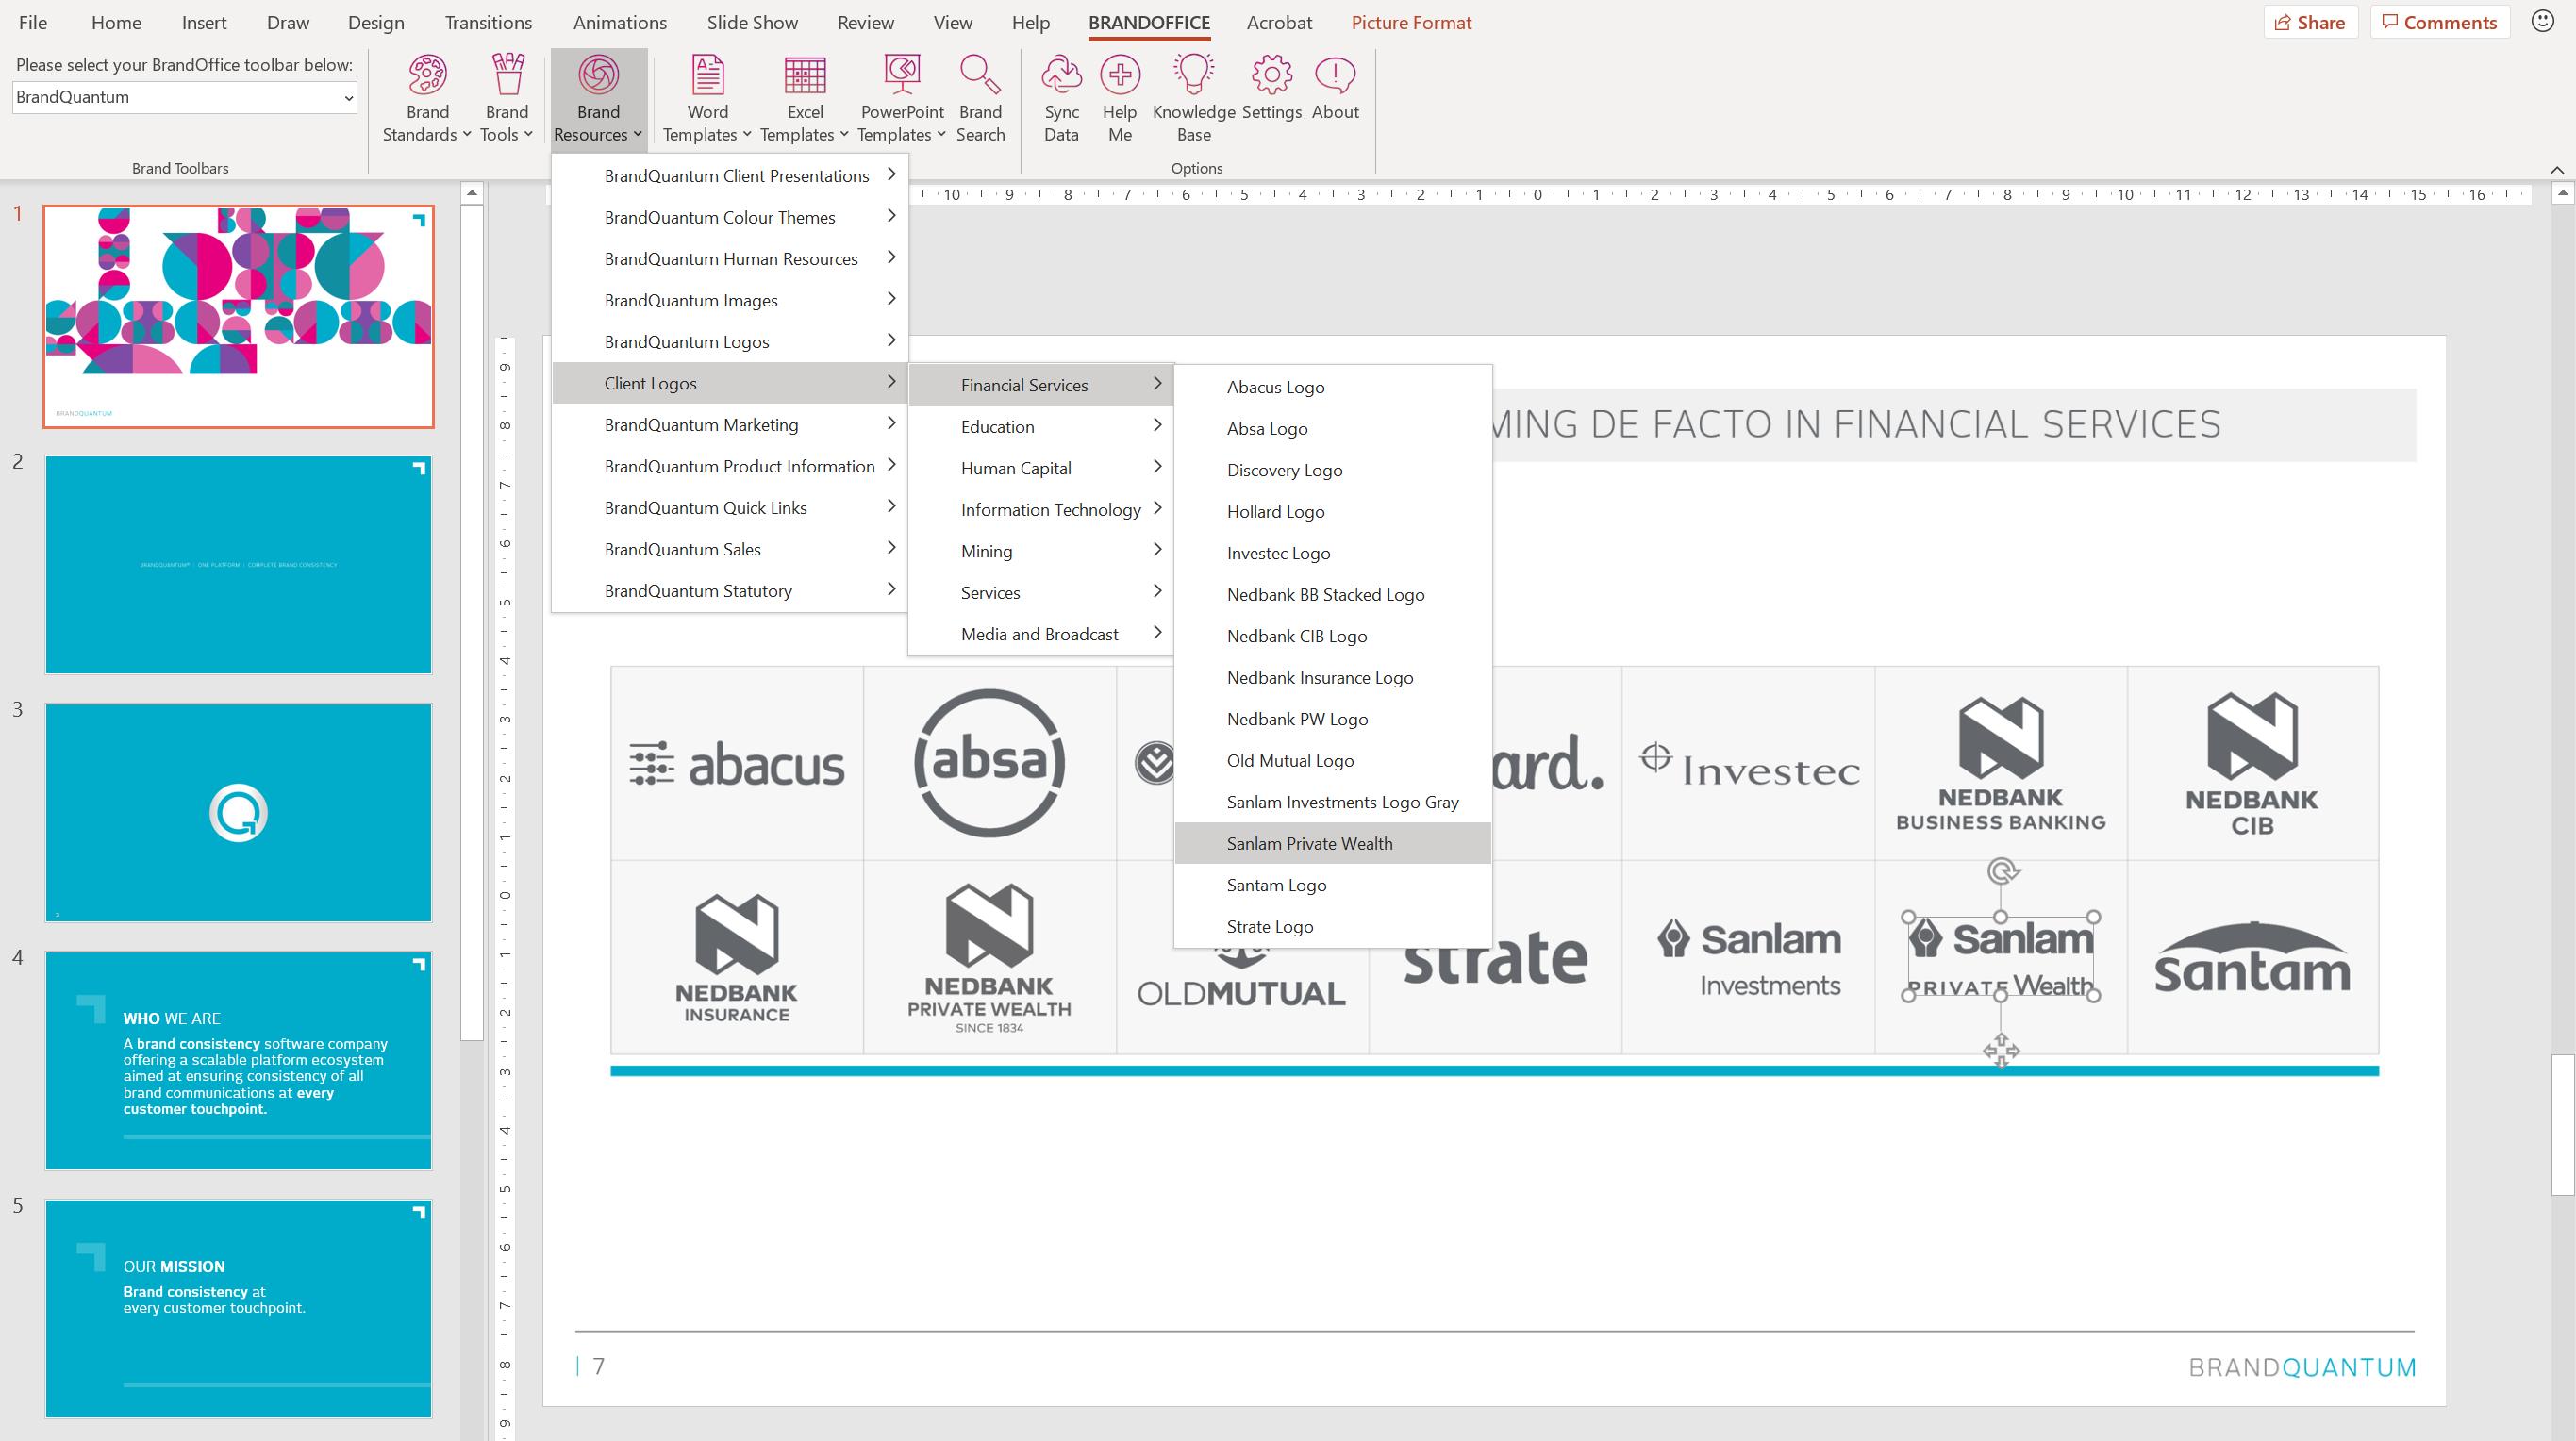 BrandOffice Software - BrandOffice document creation